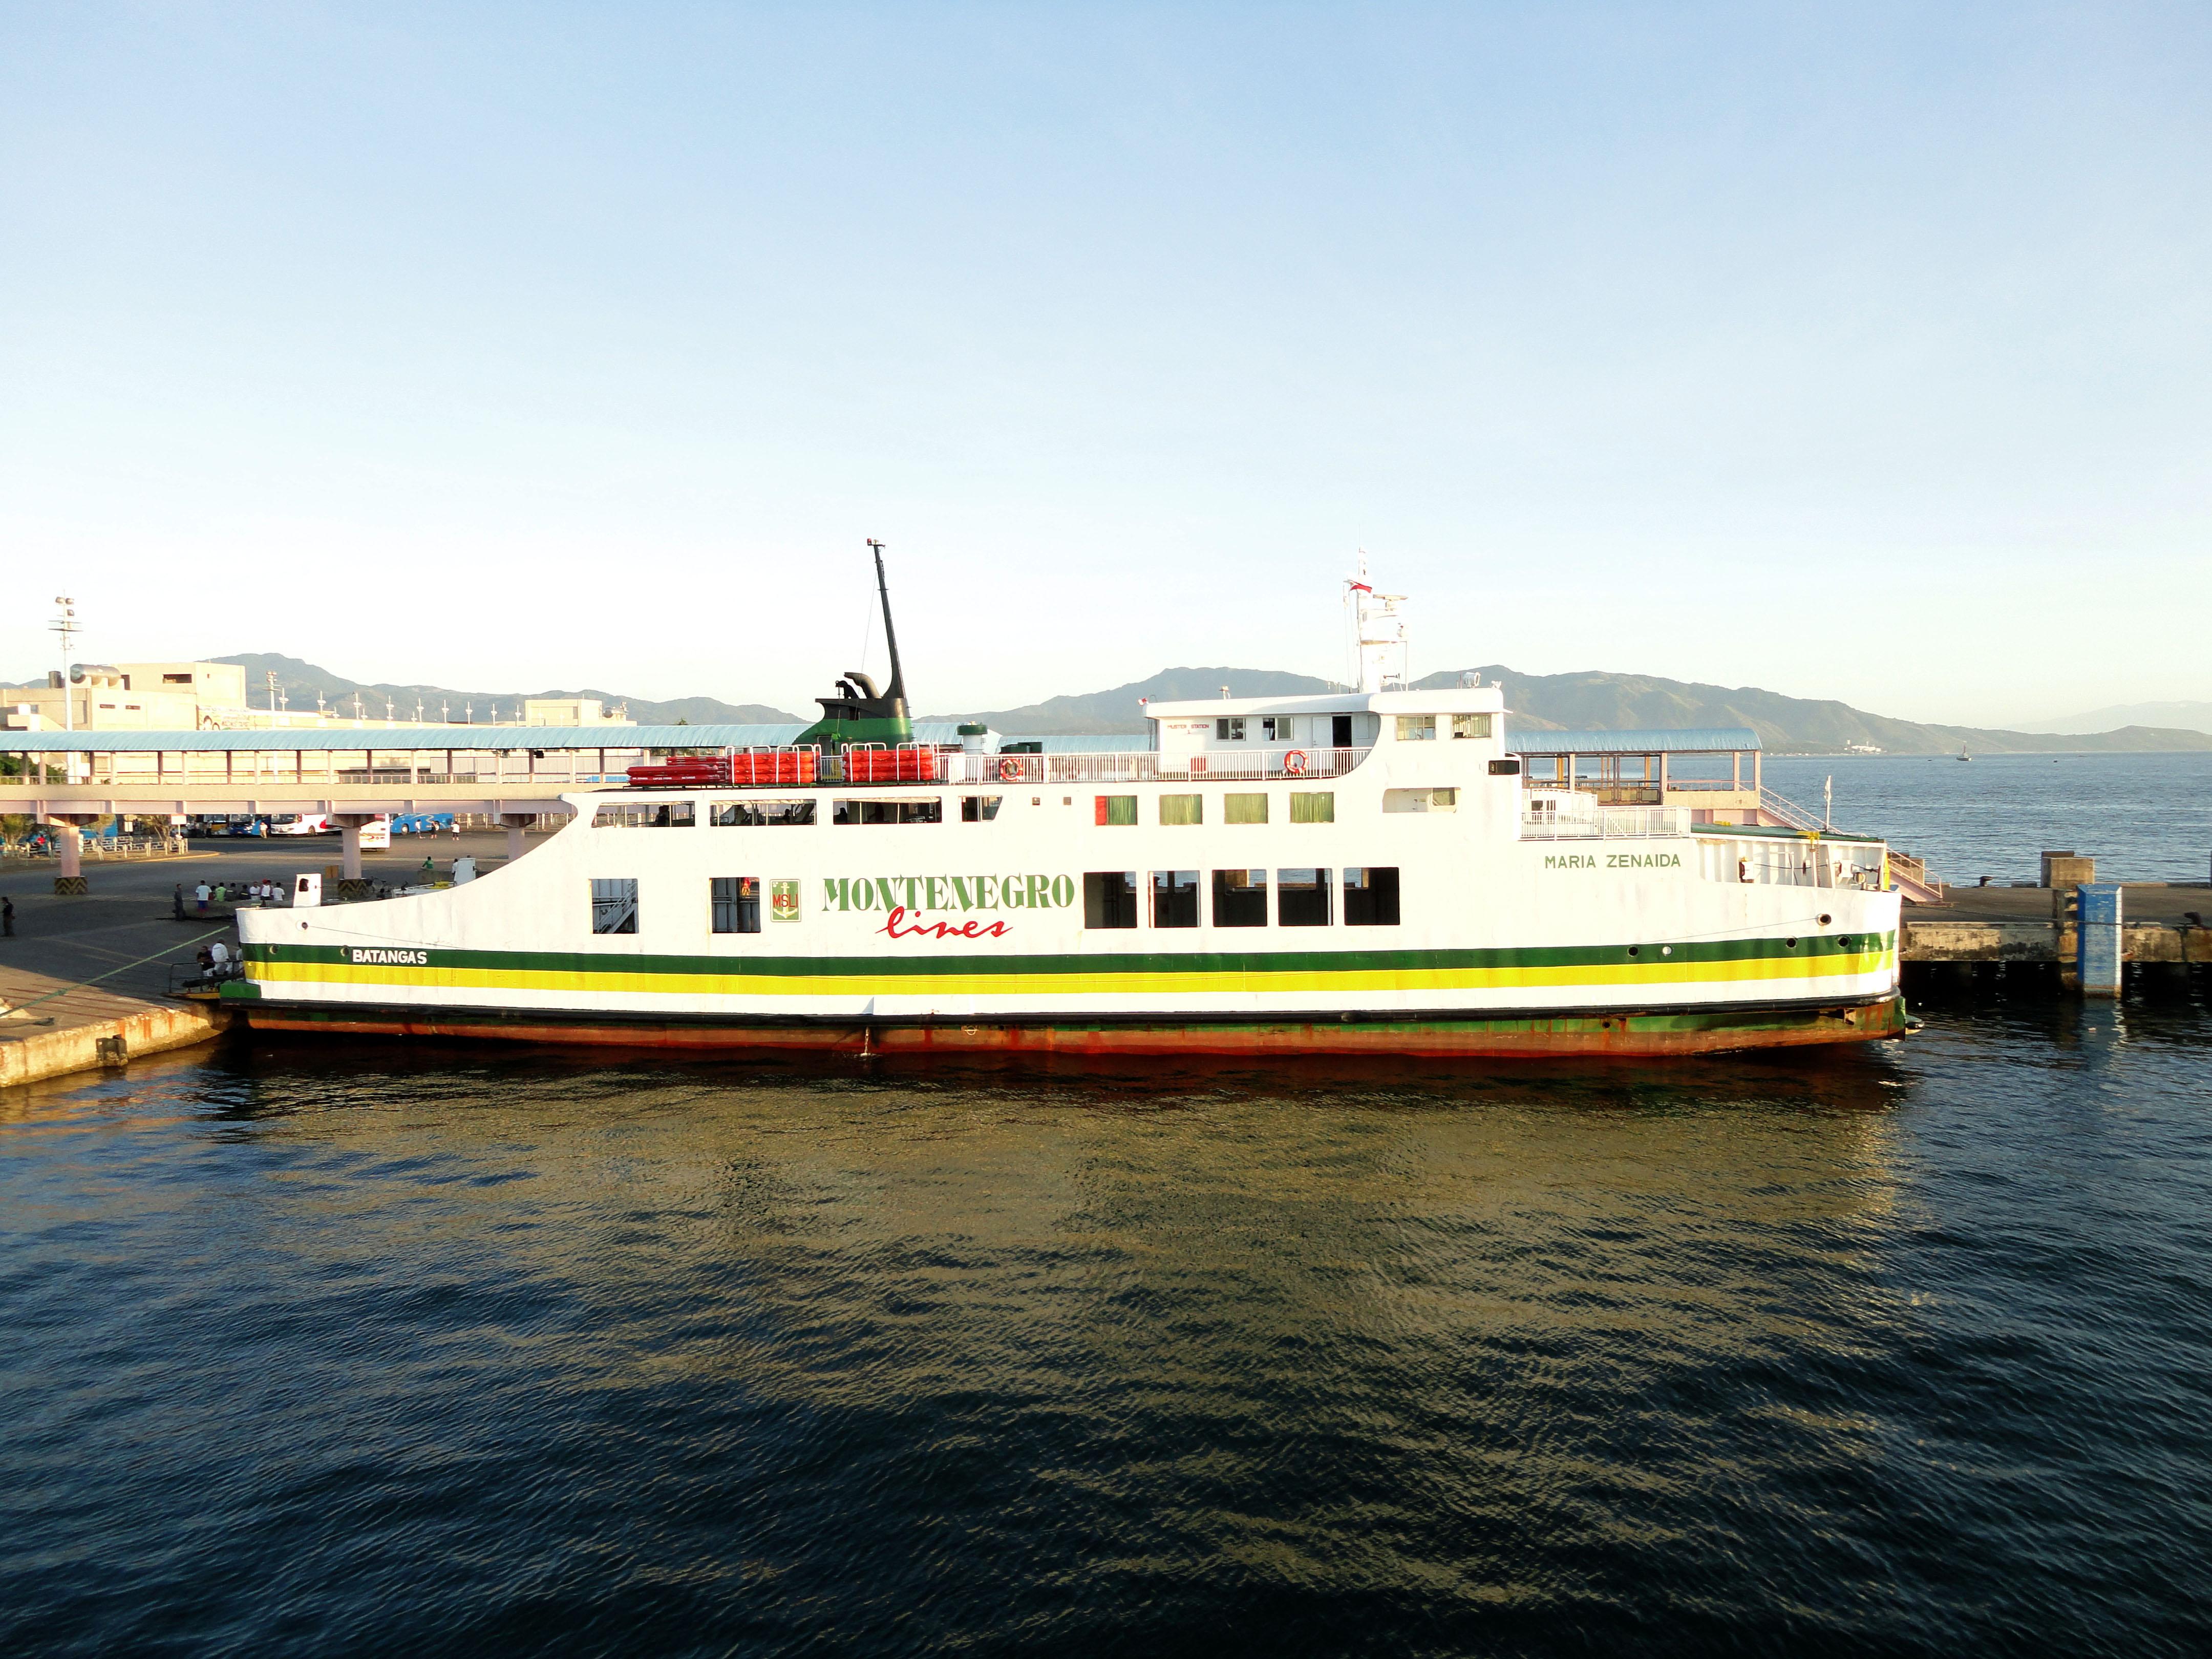 MV Maria Zenaida Montenegro lines Batangus Pier Philippines 02